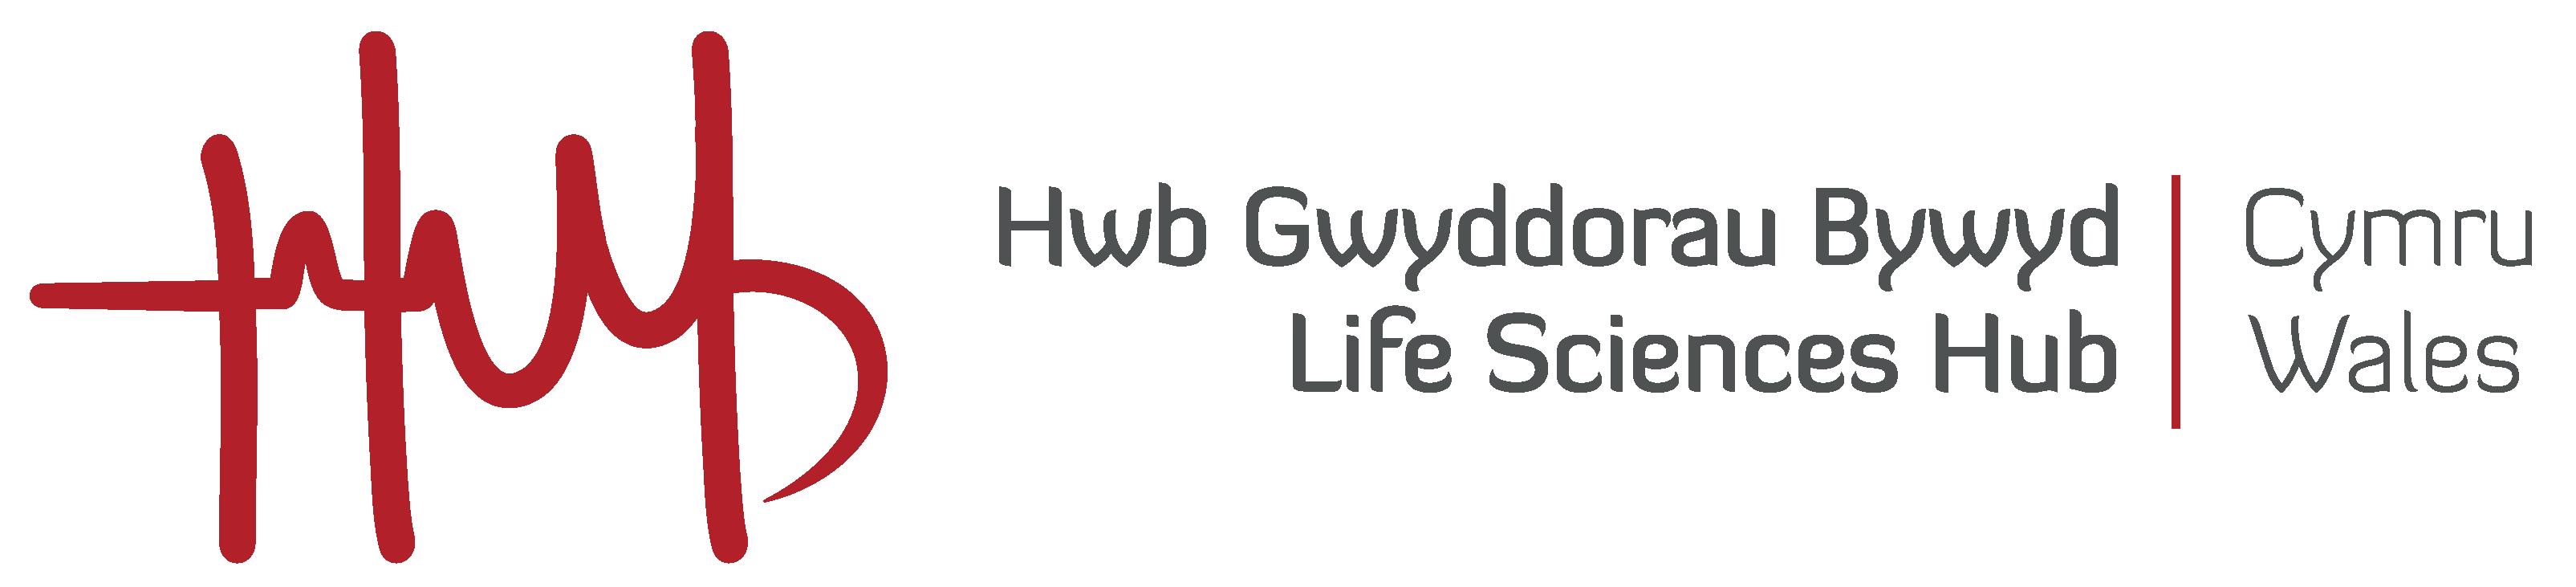 Life Sciences Hub Wales Logo